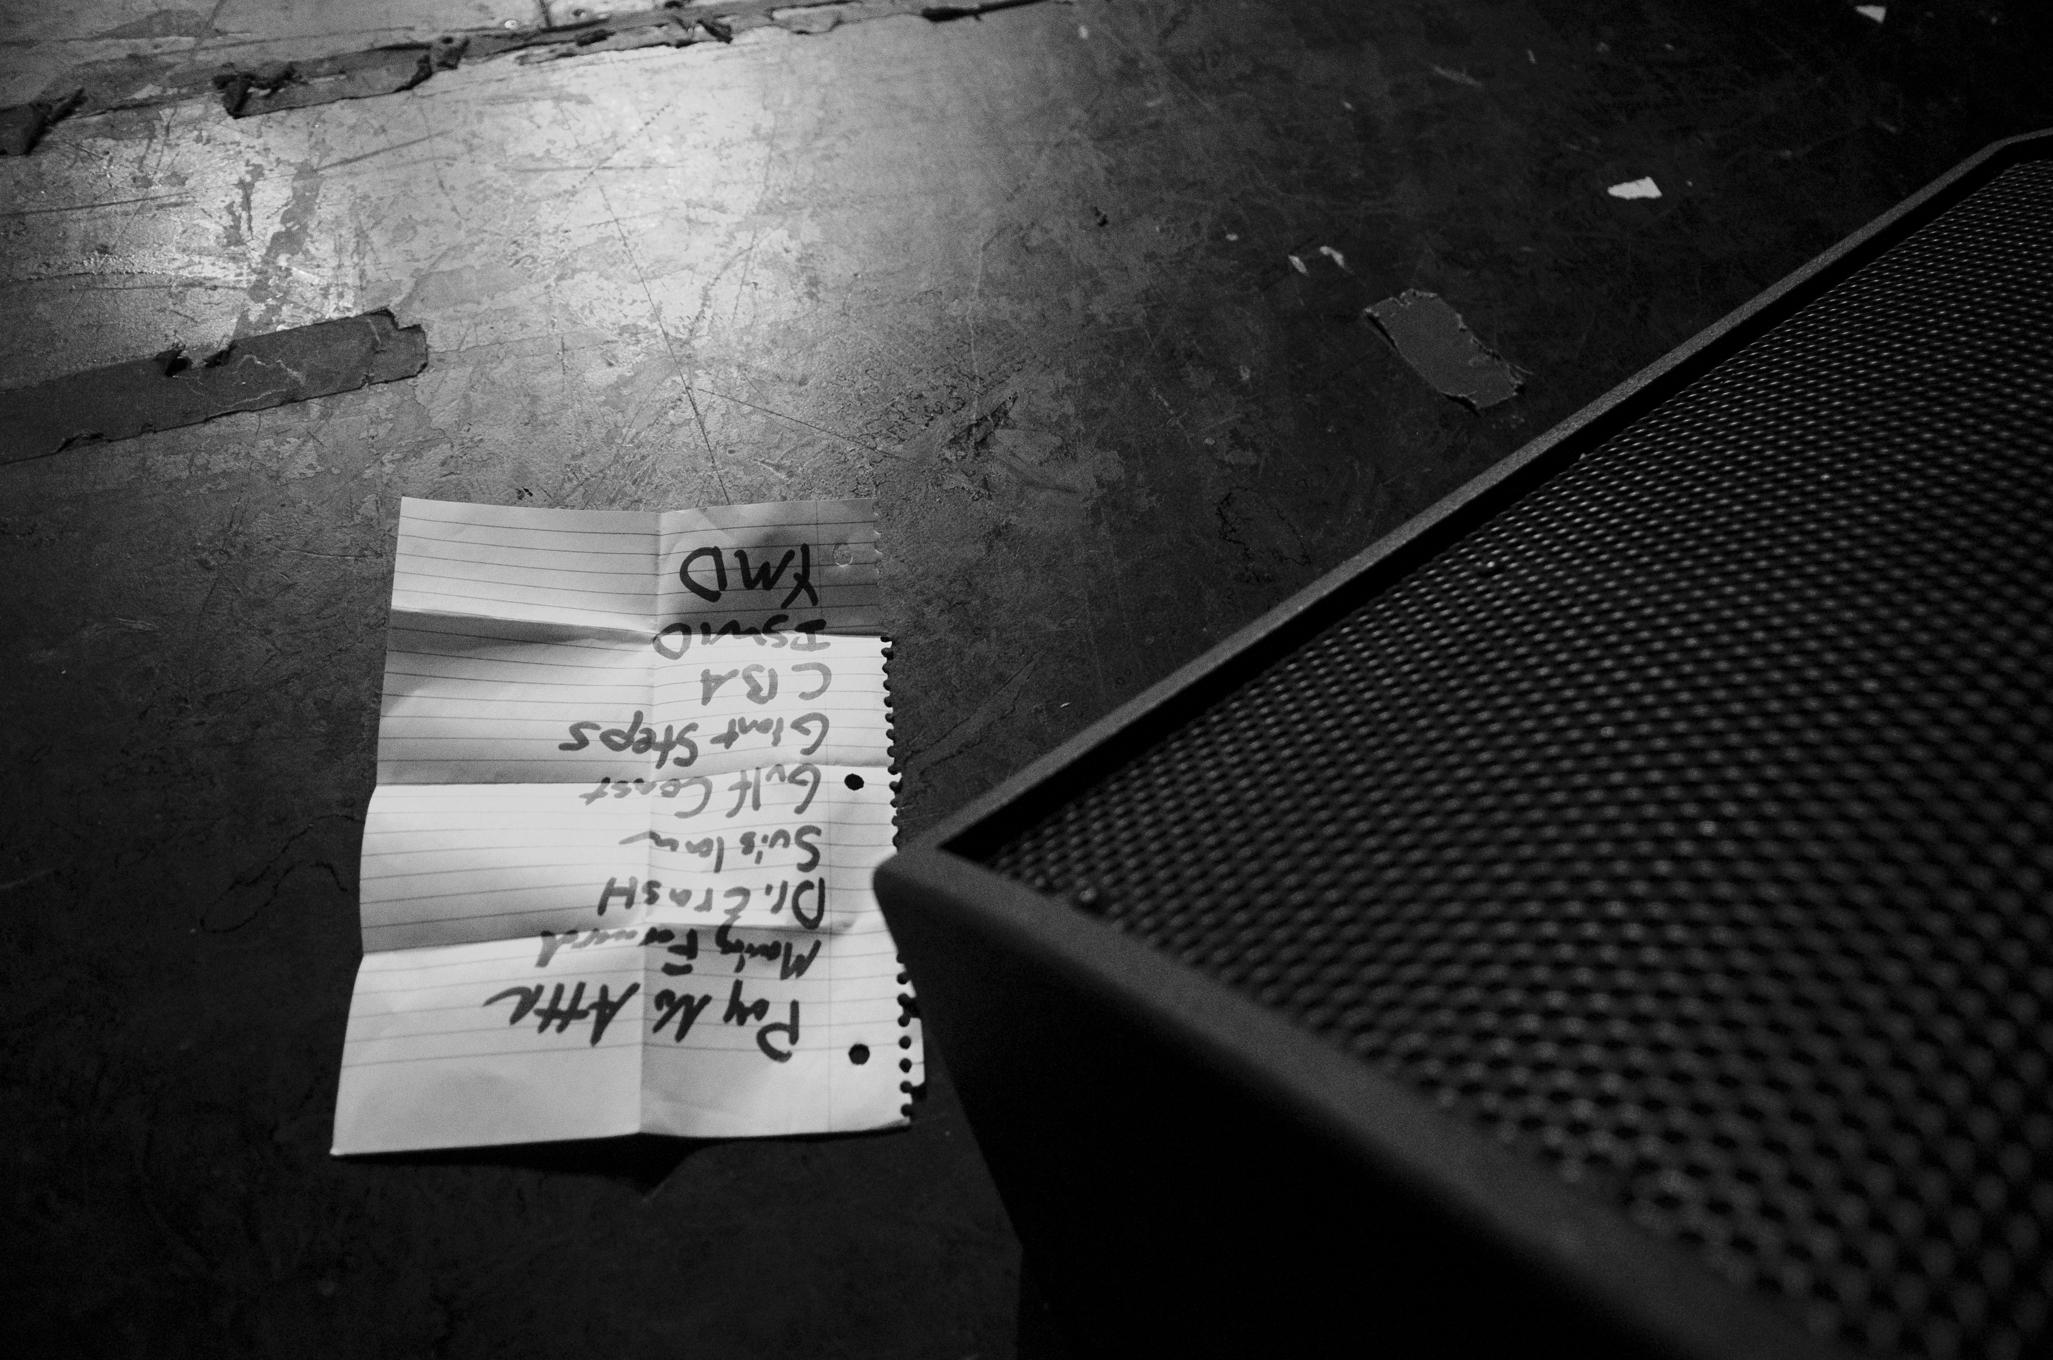 The Quitters set list at Hard Rock Live, Las Vegas. 5-18-14